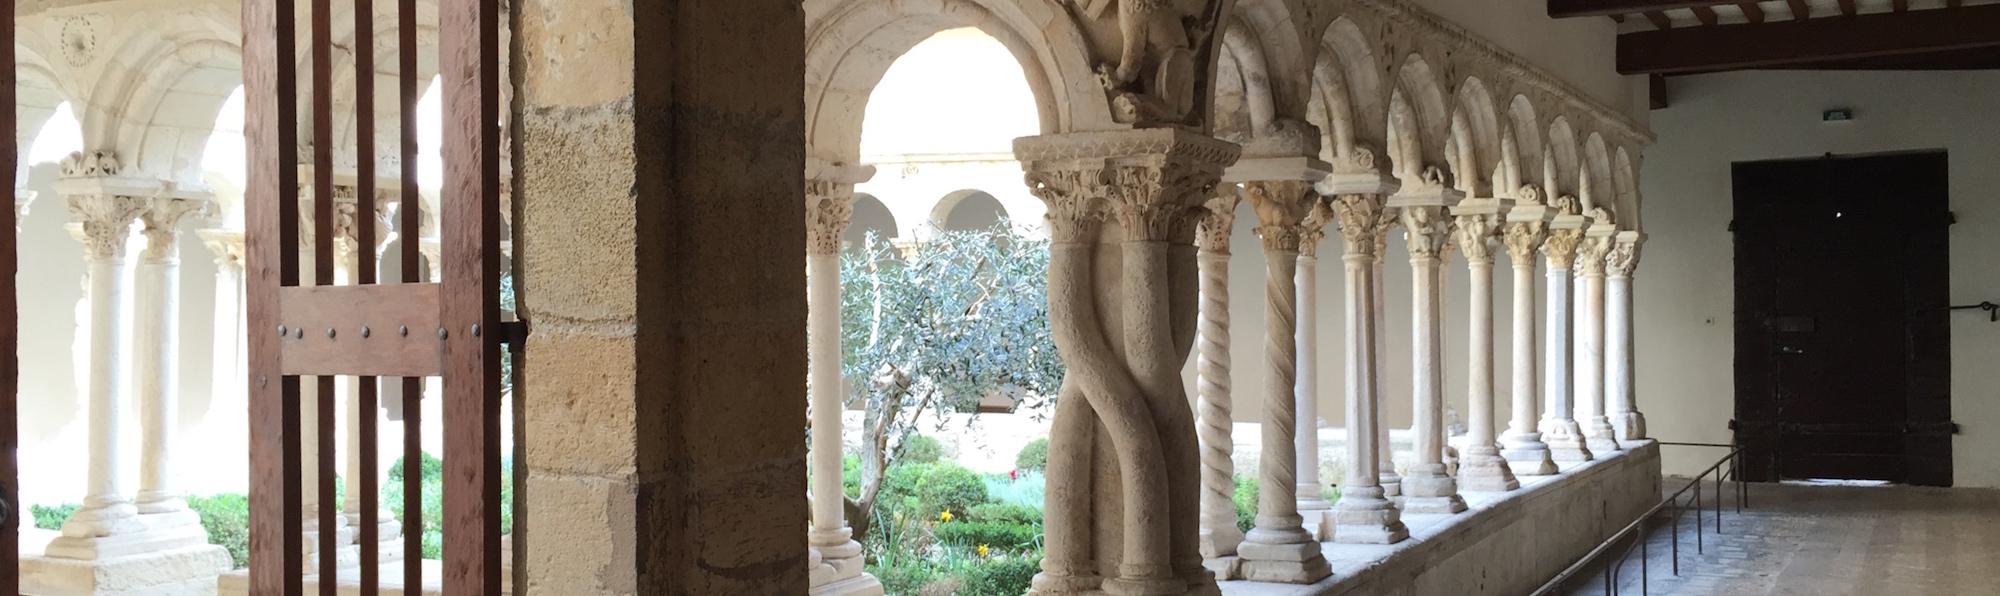 La catedral de Saint-Saveur Abajo- Aix en Provence